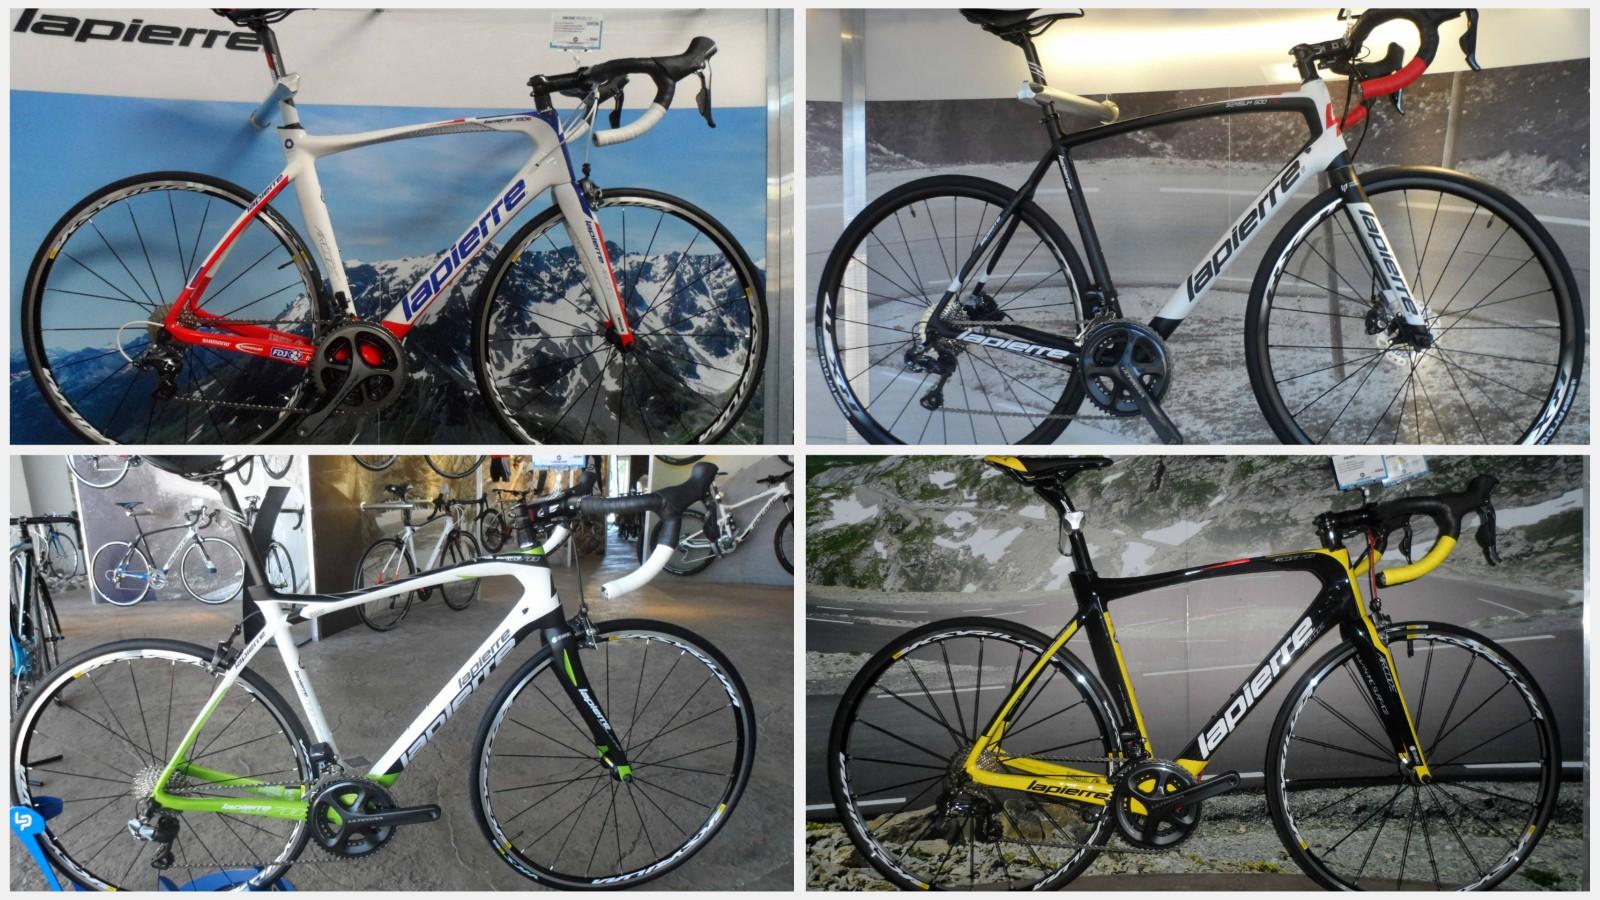 Lapierre 2015 road bikes - first look